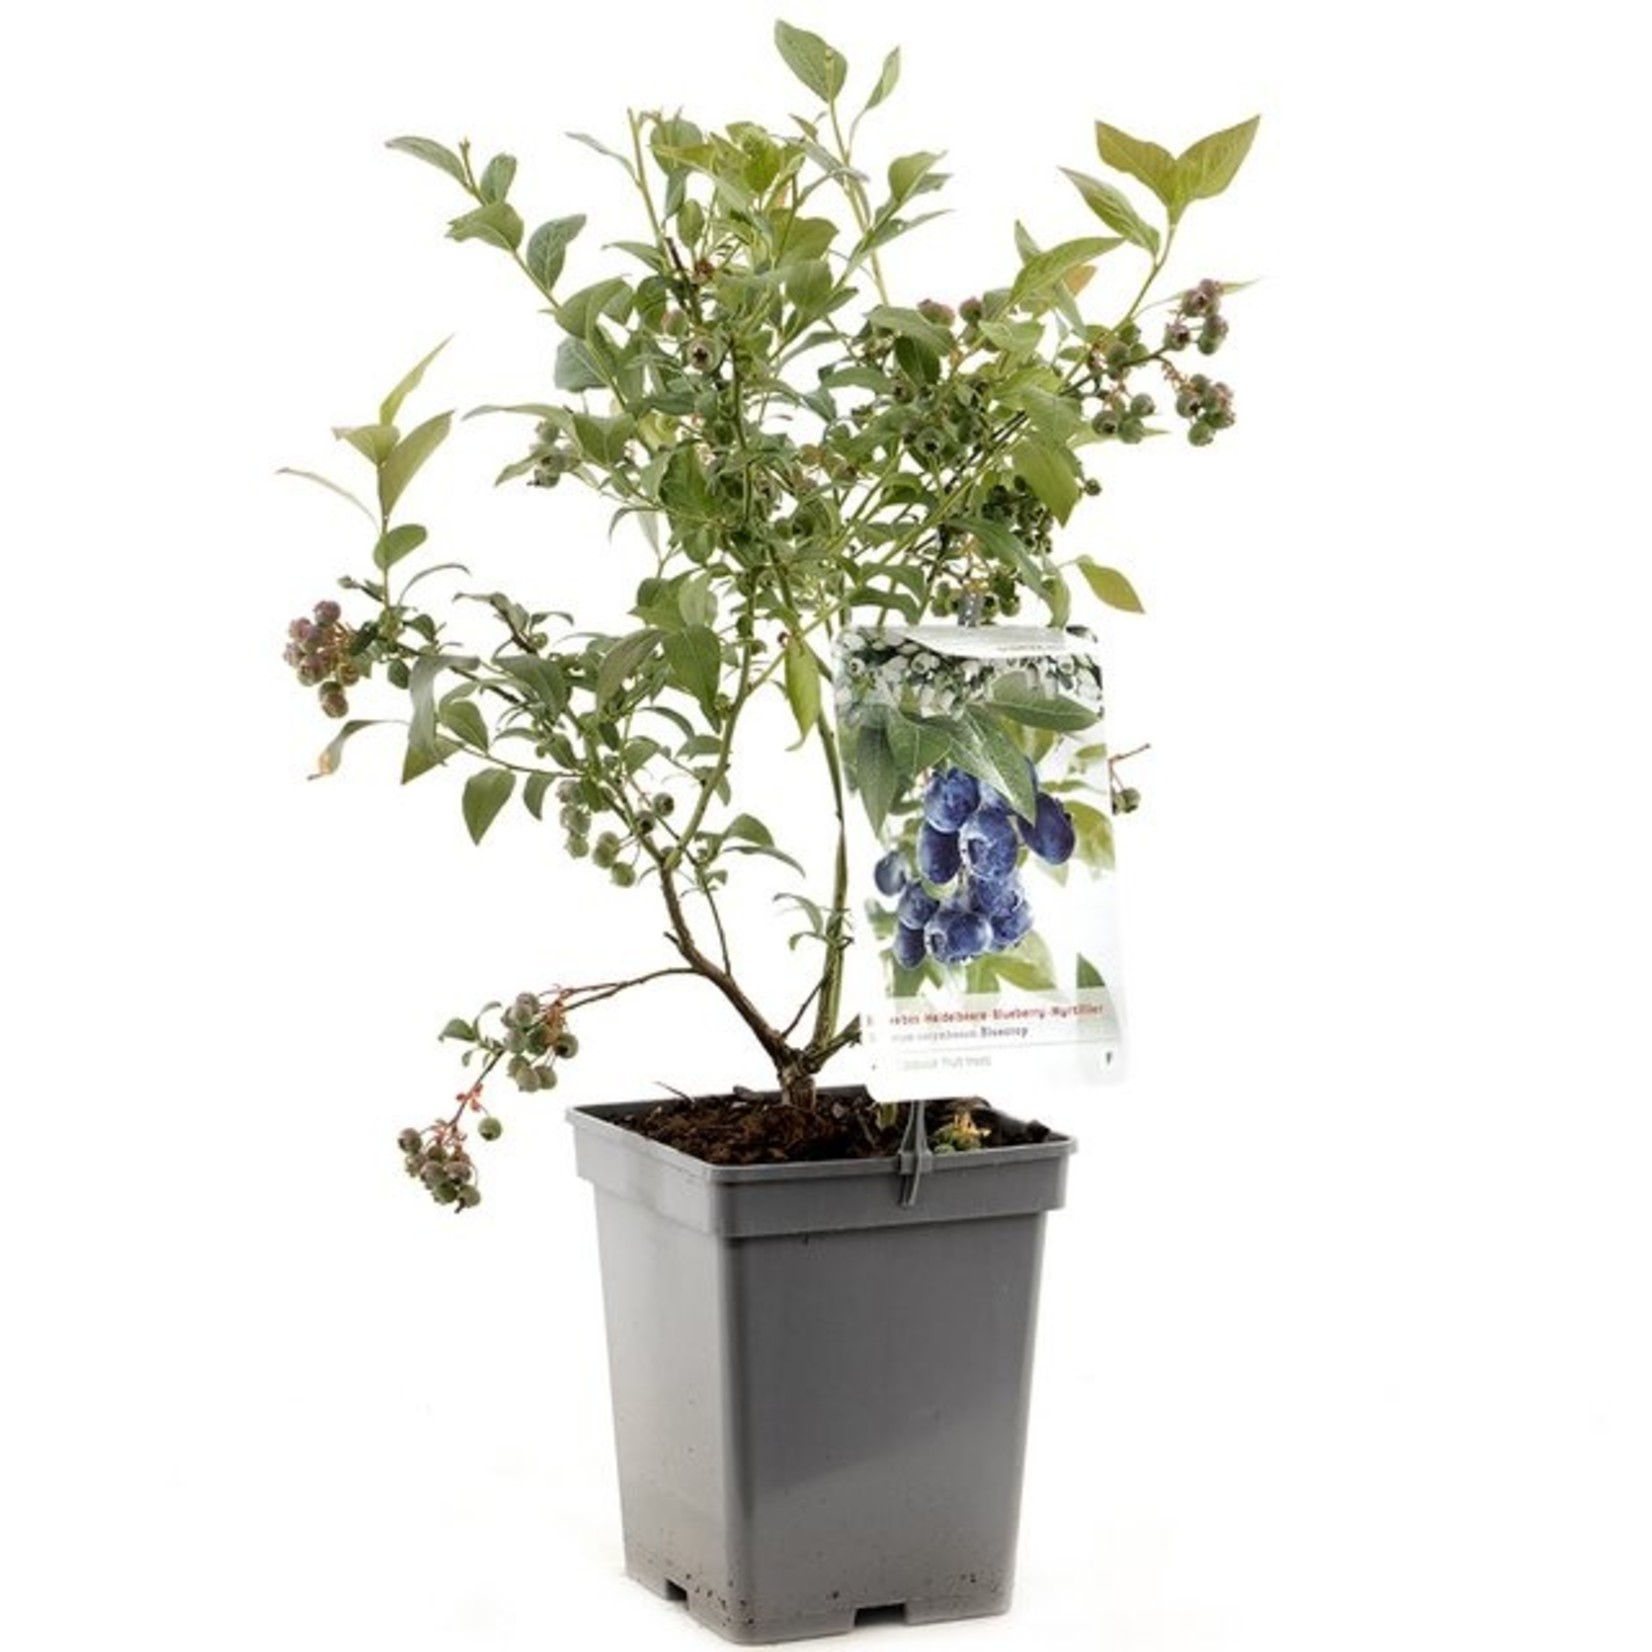 Vaccinium corymbosum 'Bluecrop' (Amerikaanse Bosbes)